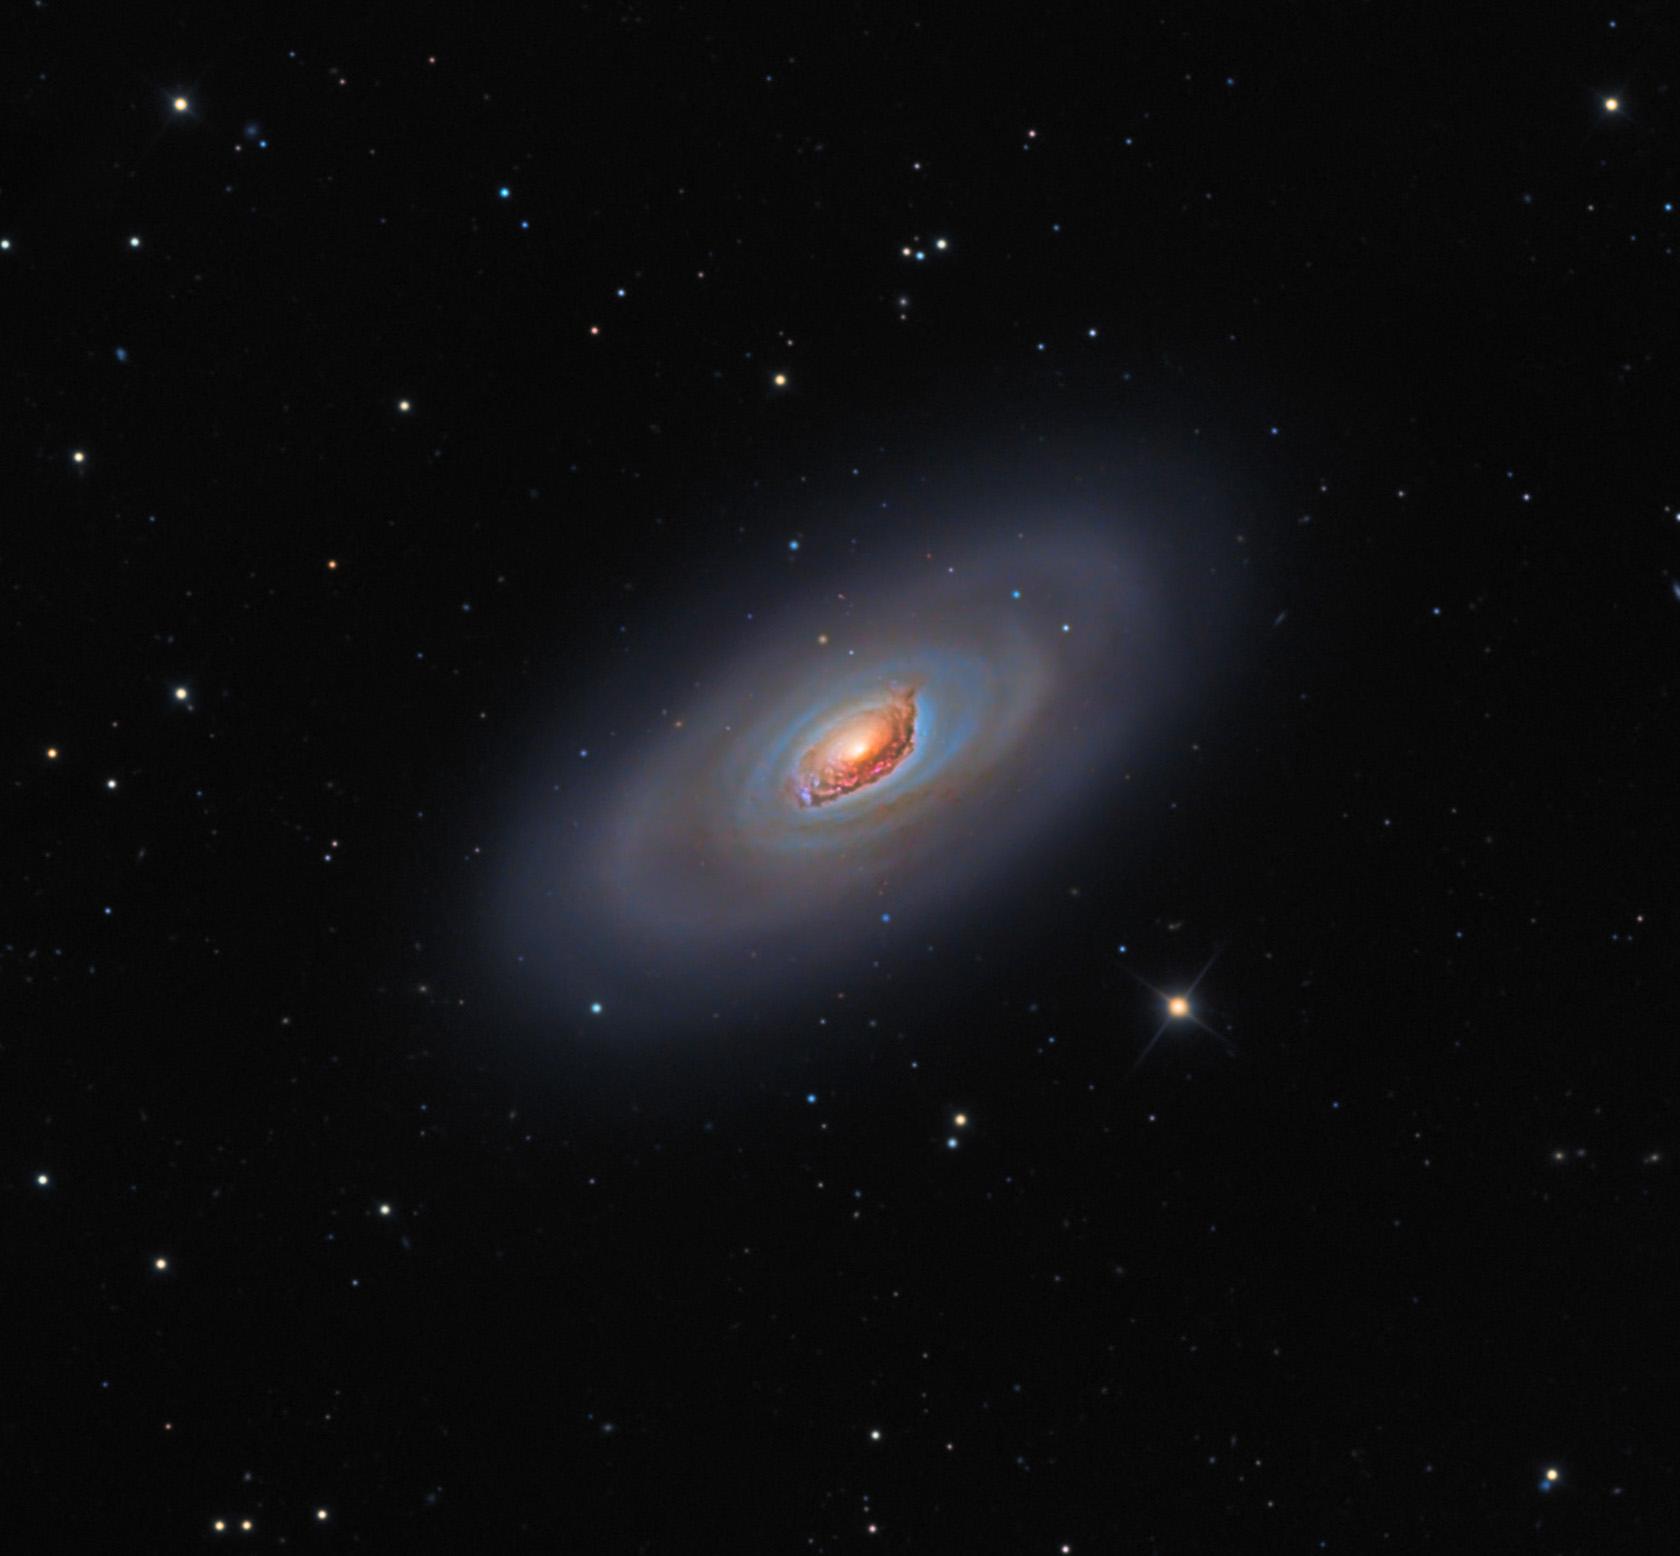 M64. Sumber: Michael Miller, Jimmy Walker / NASA